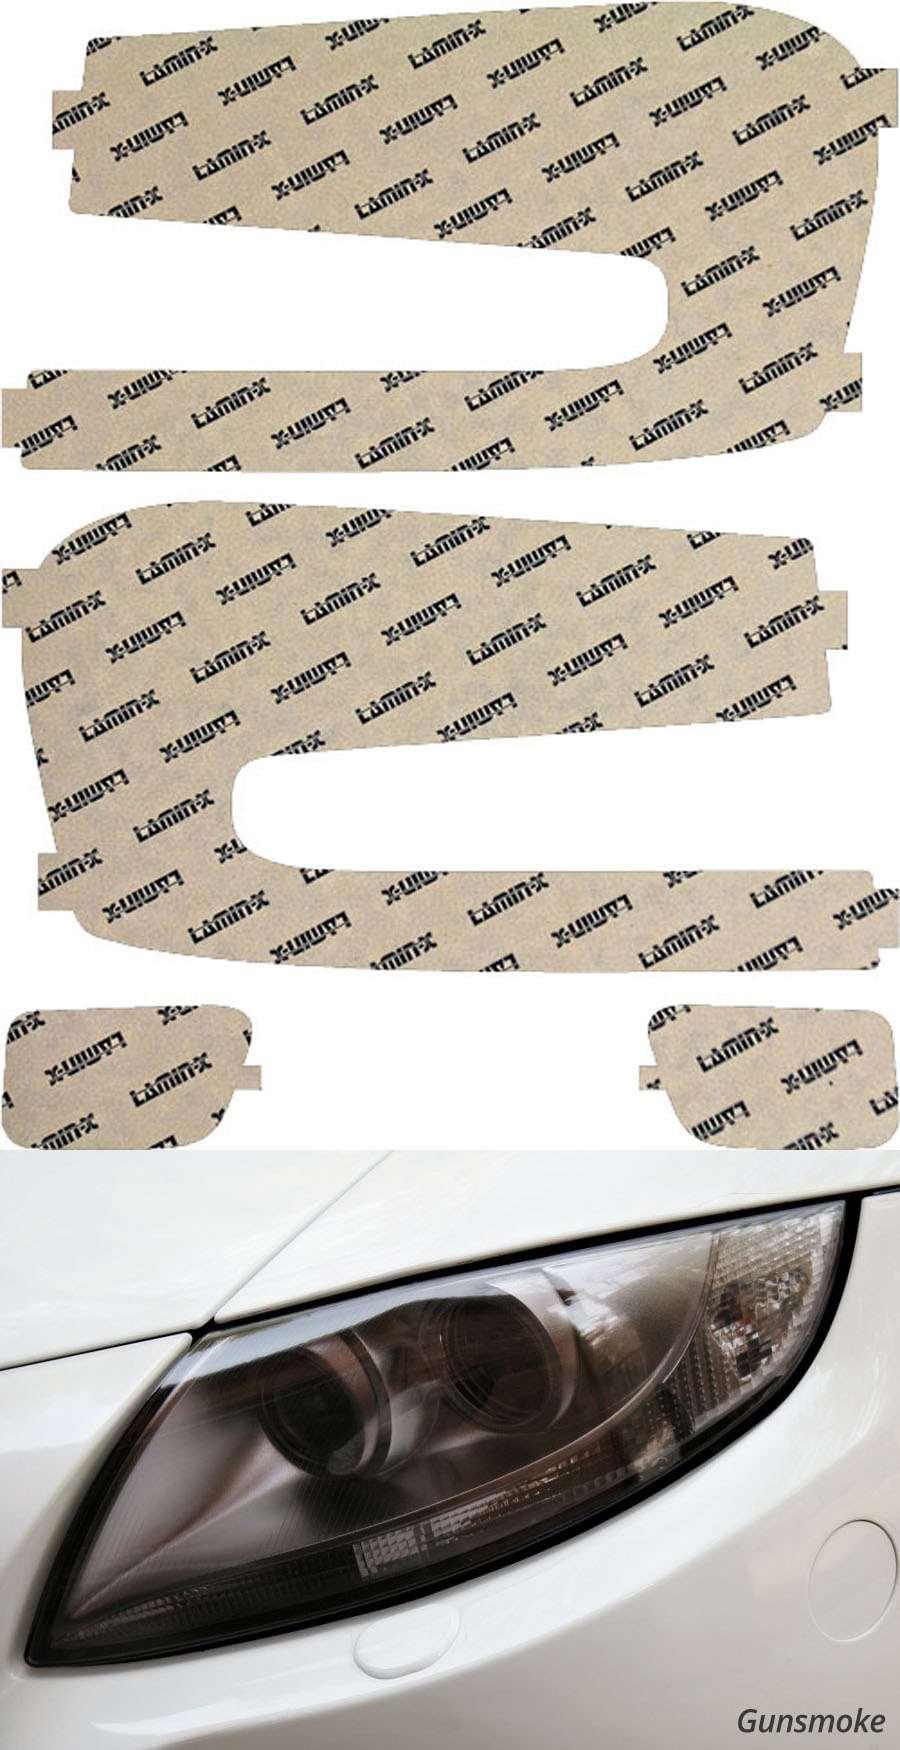 Chevrolet Trailblazer 02-06 Gunsmoke Headlight Covers Lamin-X CH007G